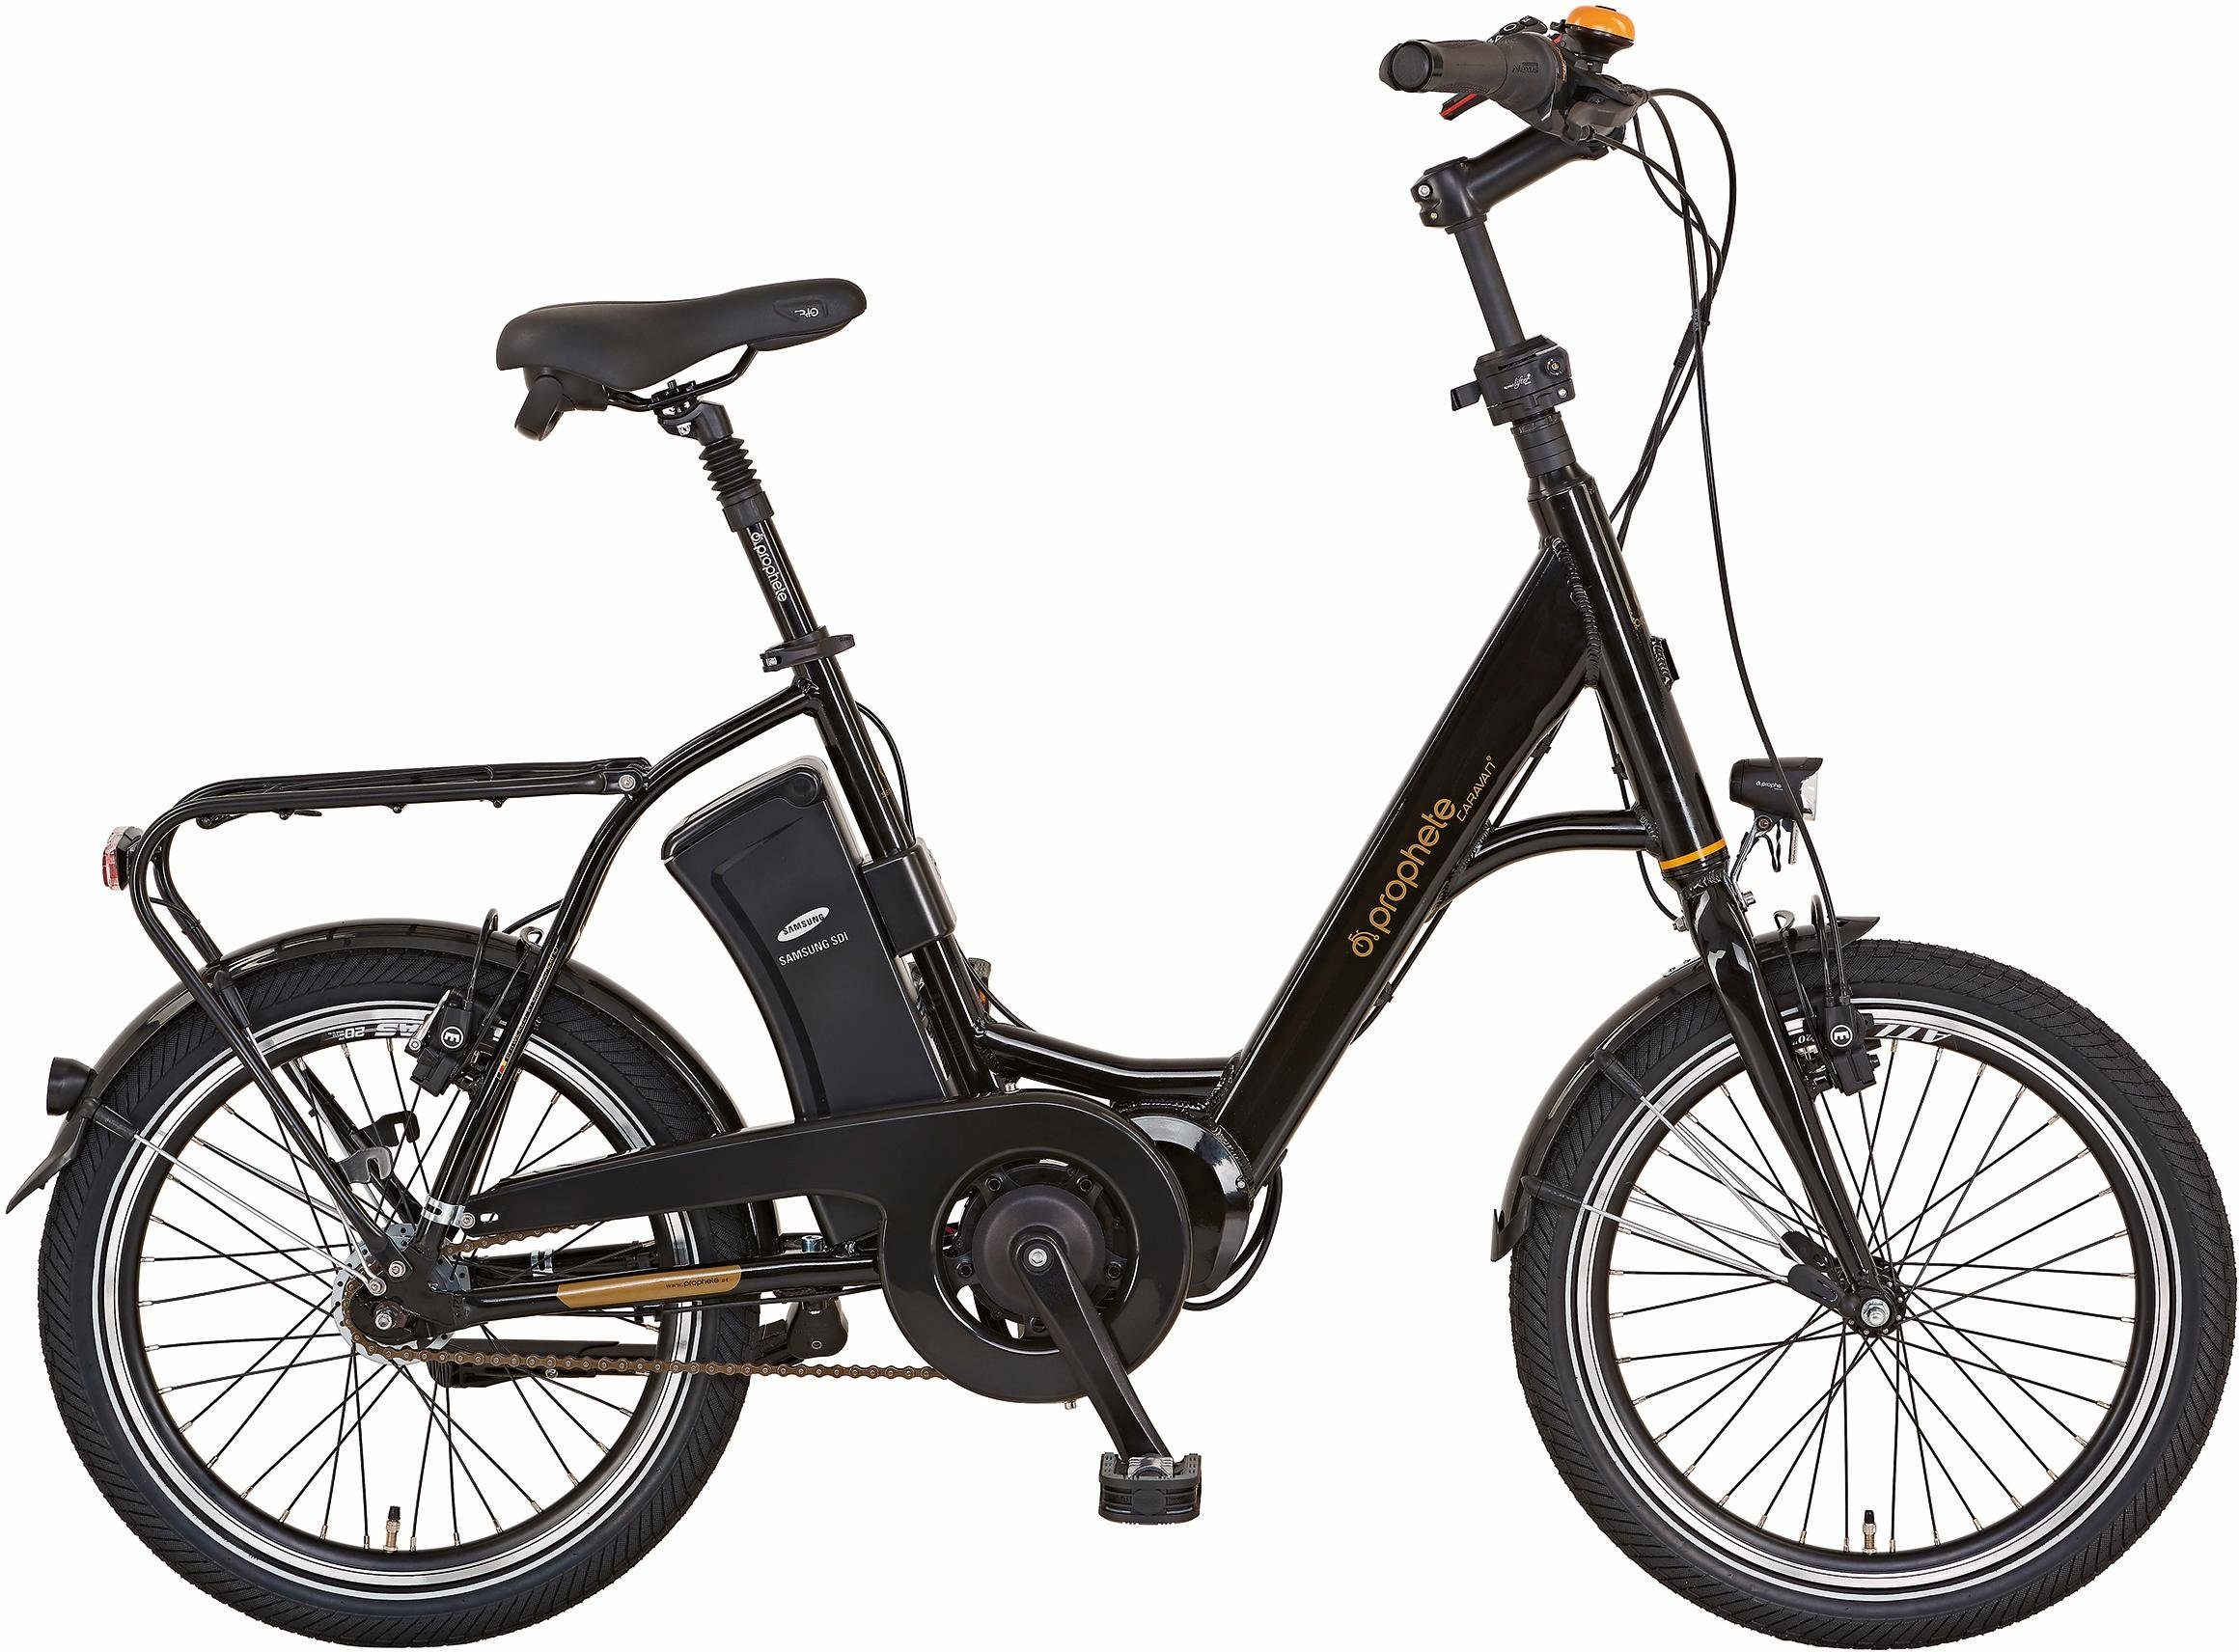 Prophete Kompakt E-Bike, Mittelmotor 36V/250W, 20 Zoll, 7 Gang Shimano Nexus, »Navigator Caravan e«